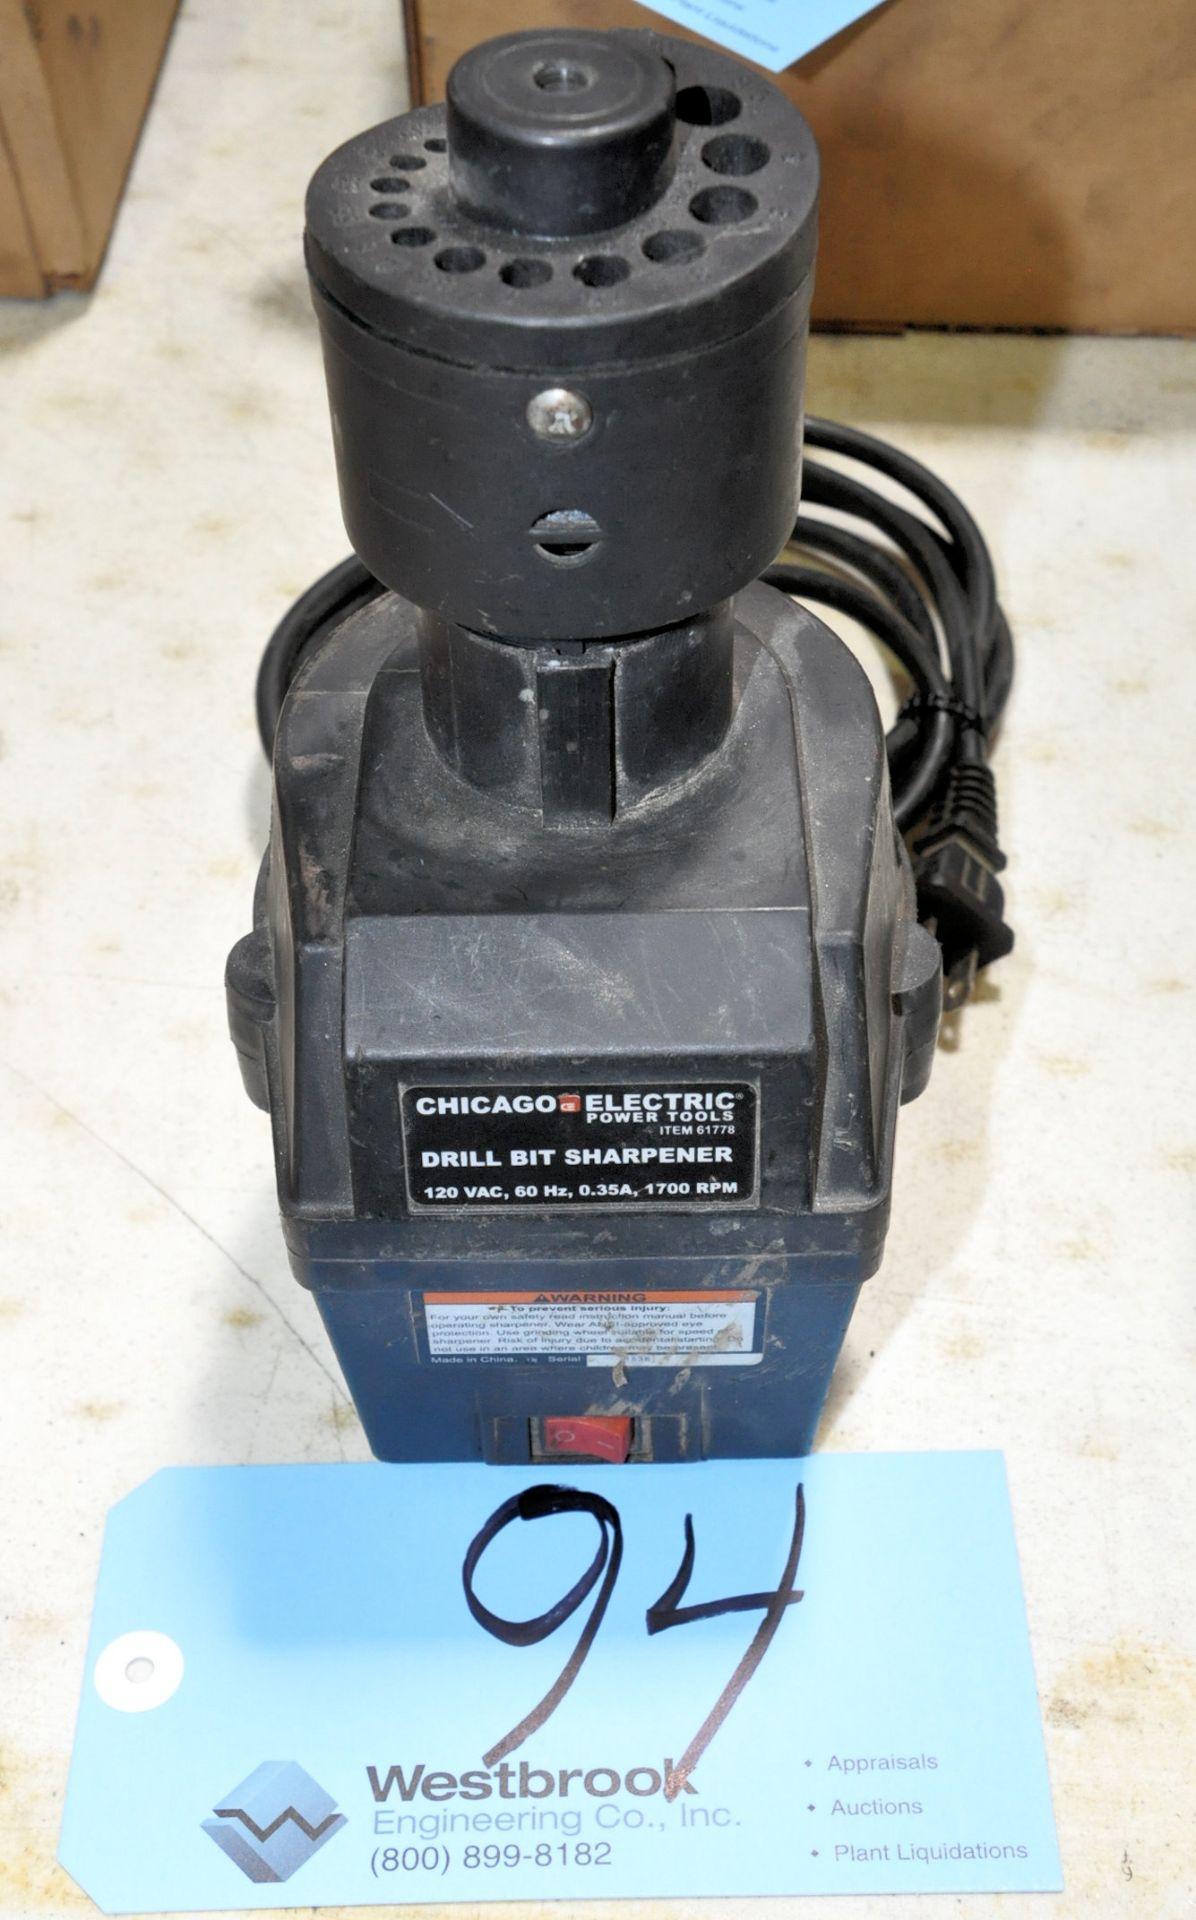 Lot 94 - Chicago Electric Drill Bit Sharpener